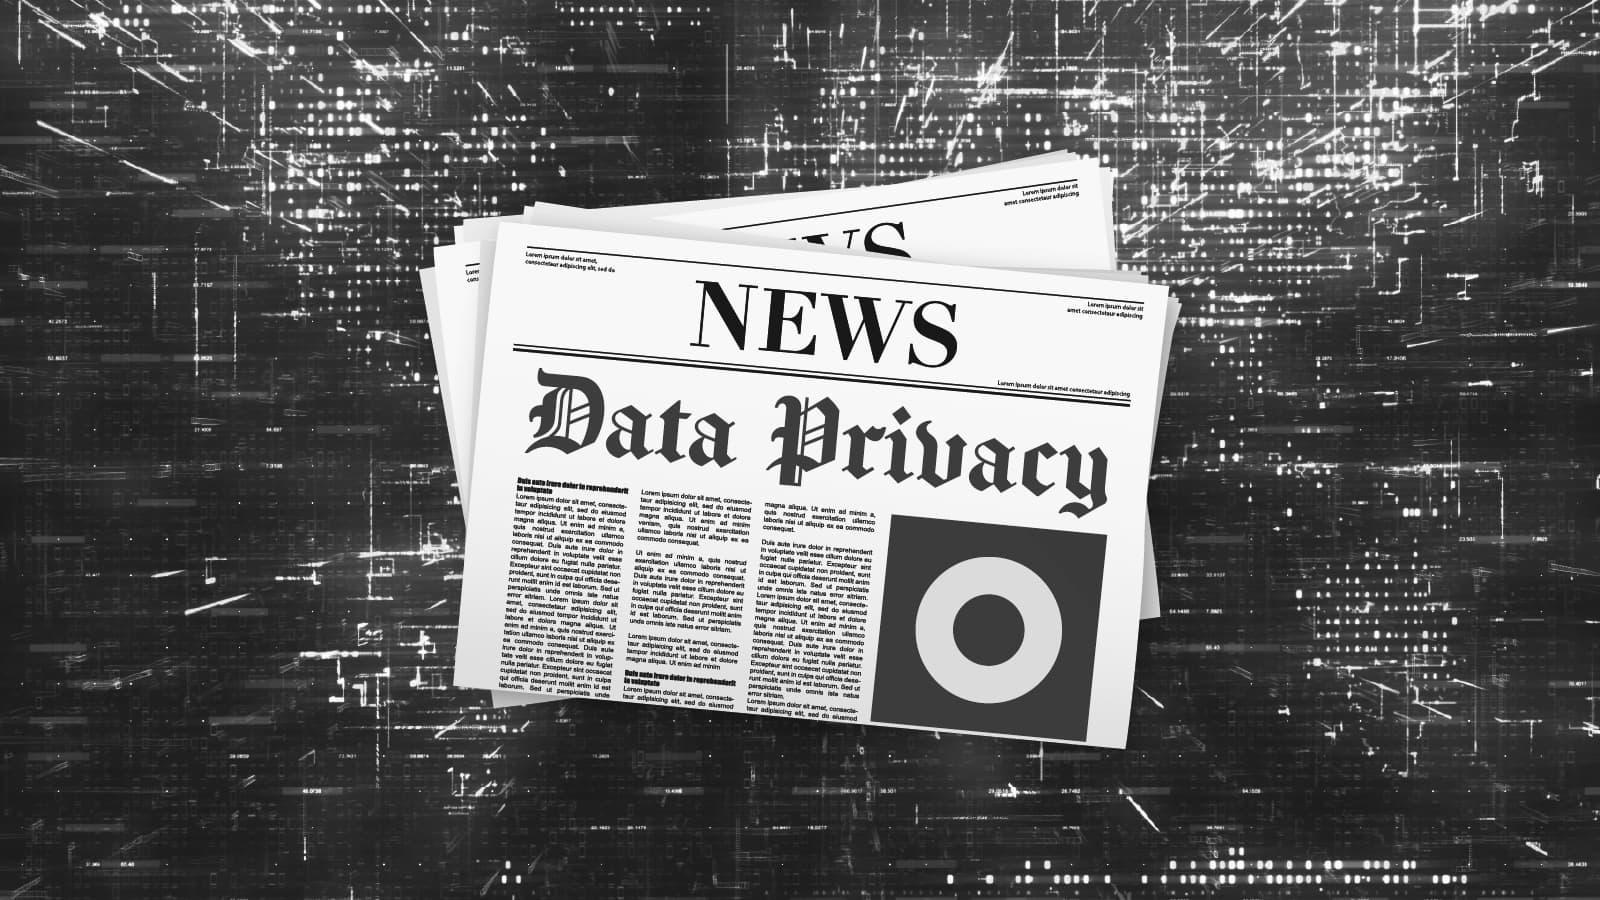 Privacy newsletter - April 21, 2020